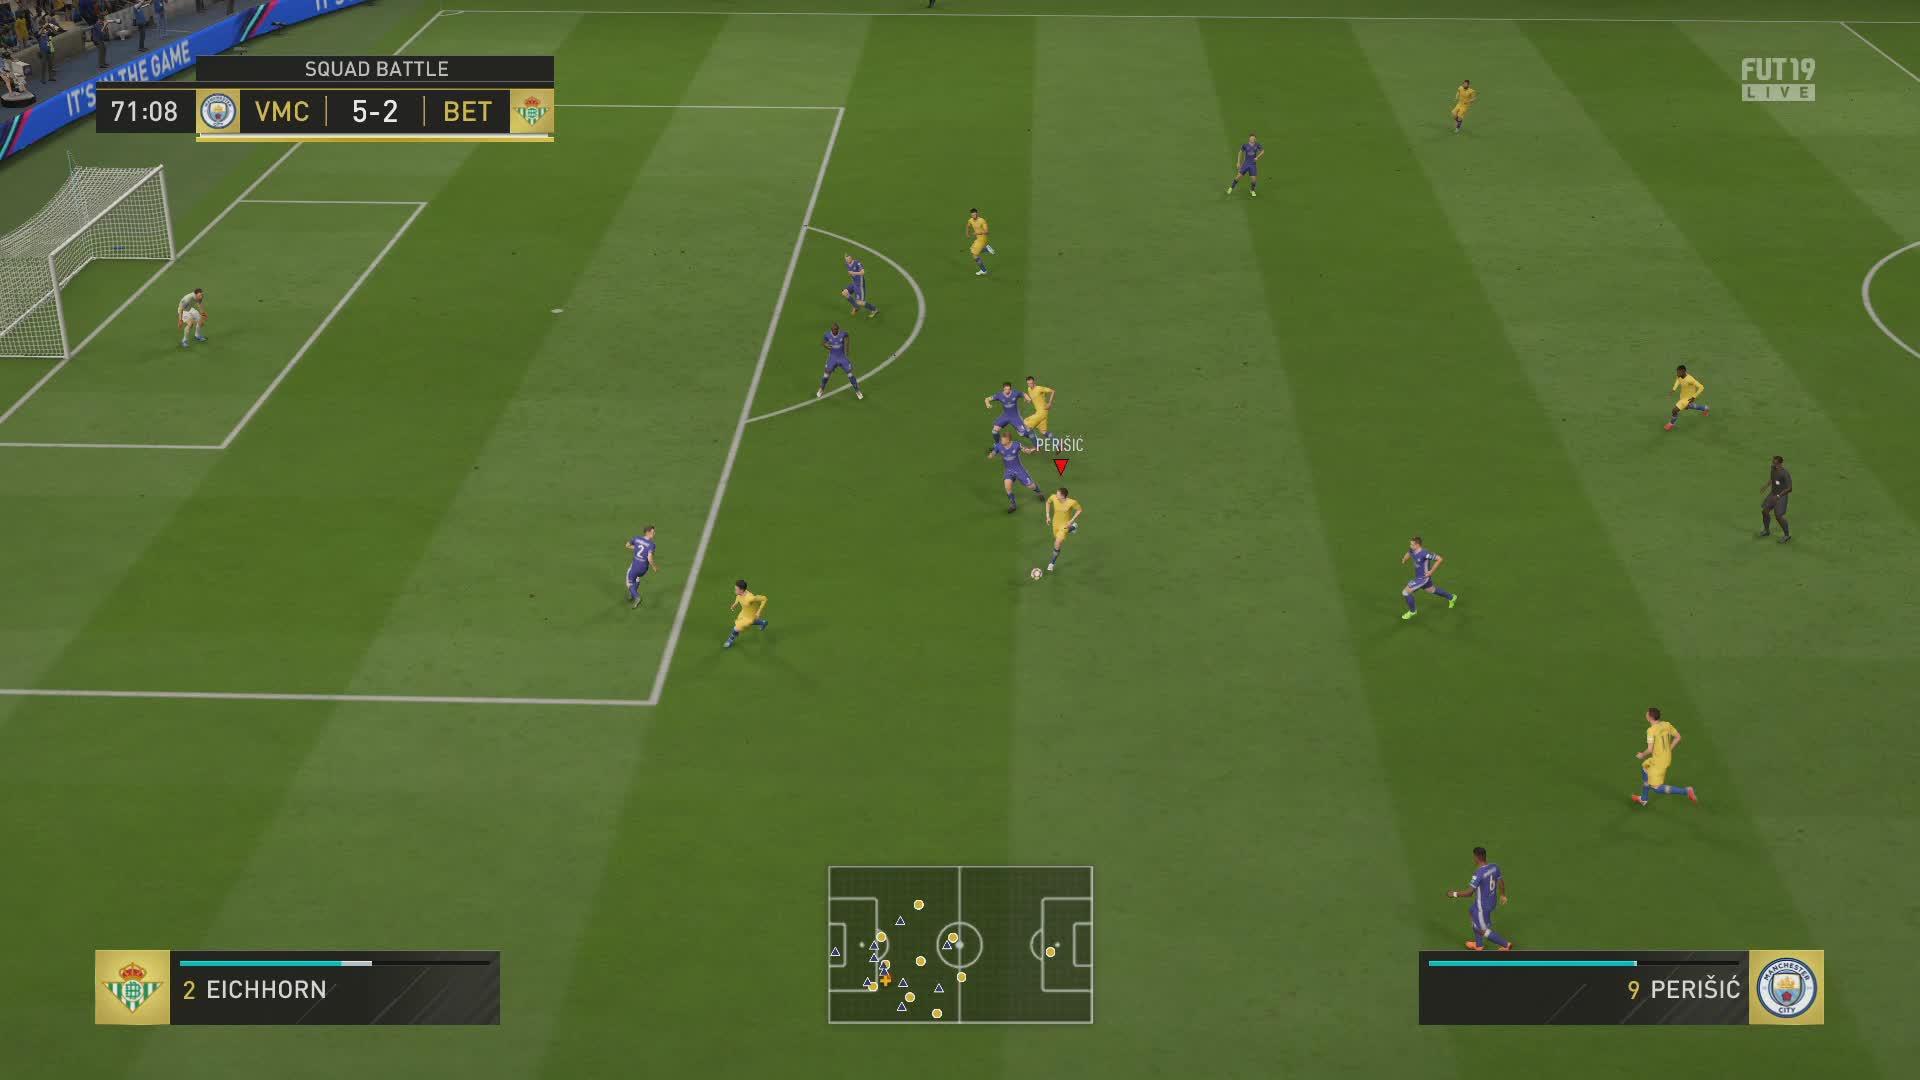 fifa, juggling goal1 GIFs